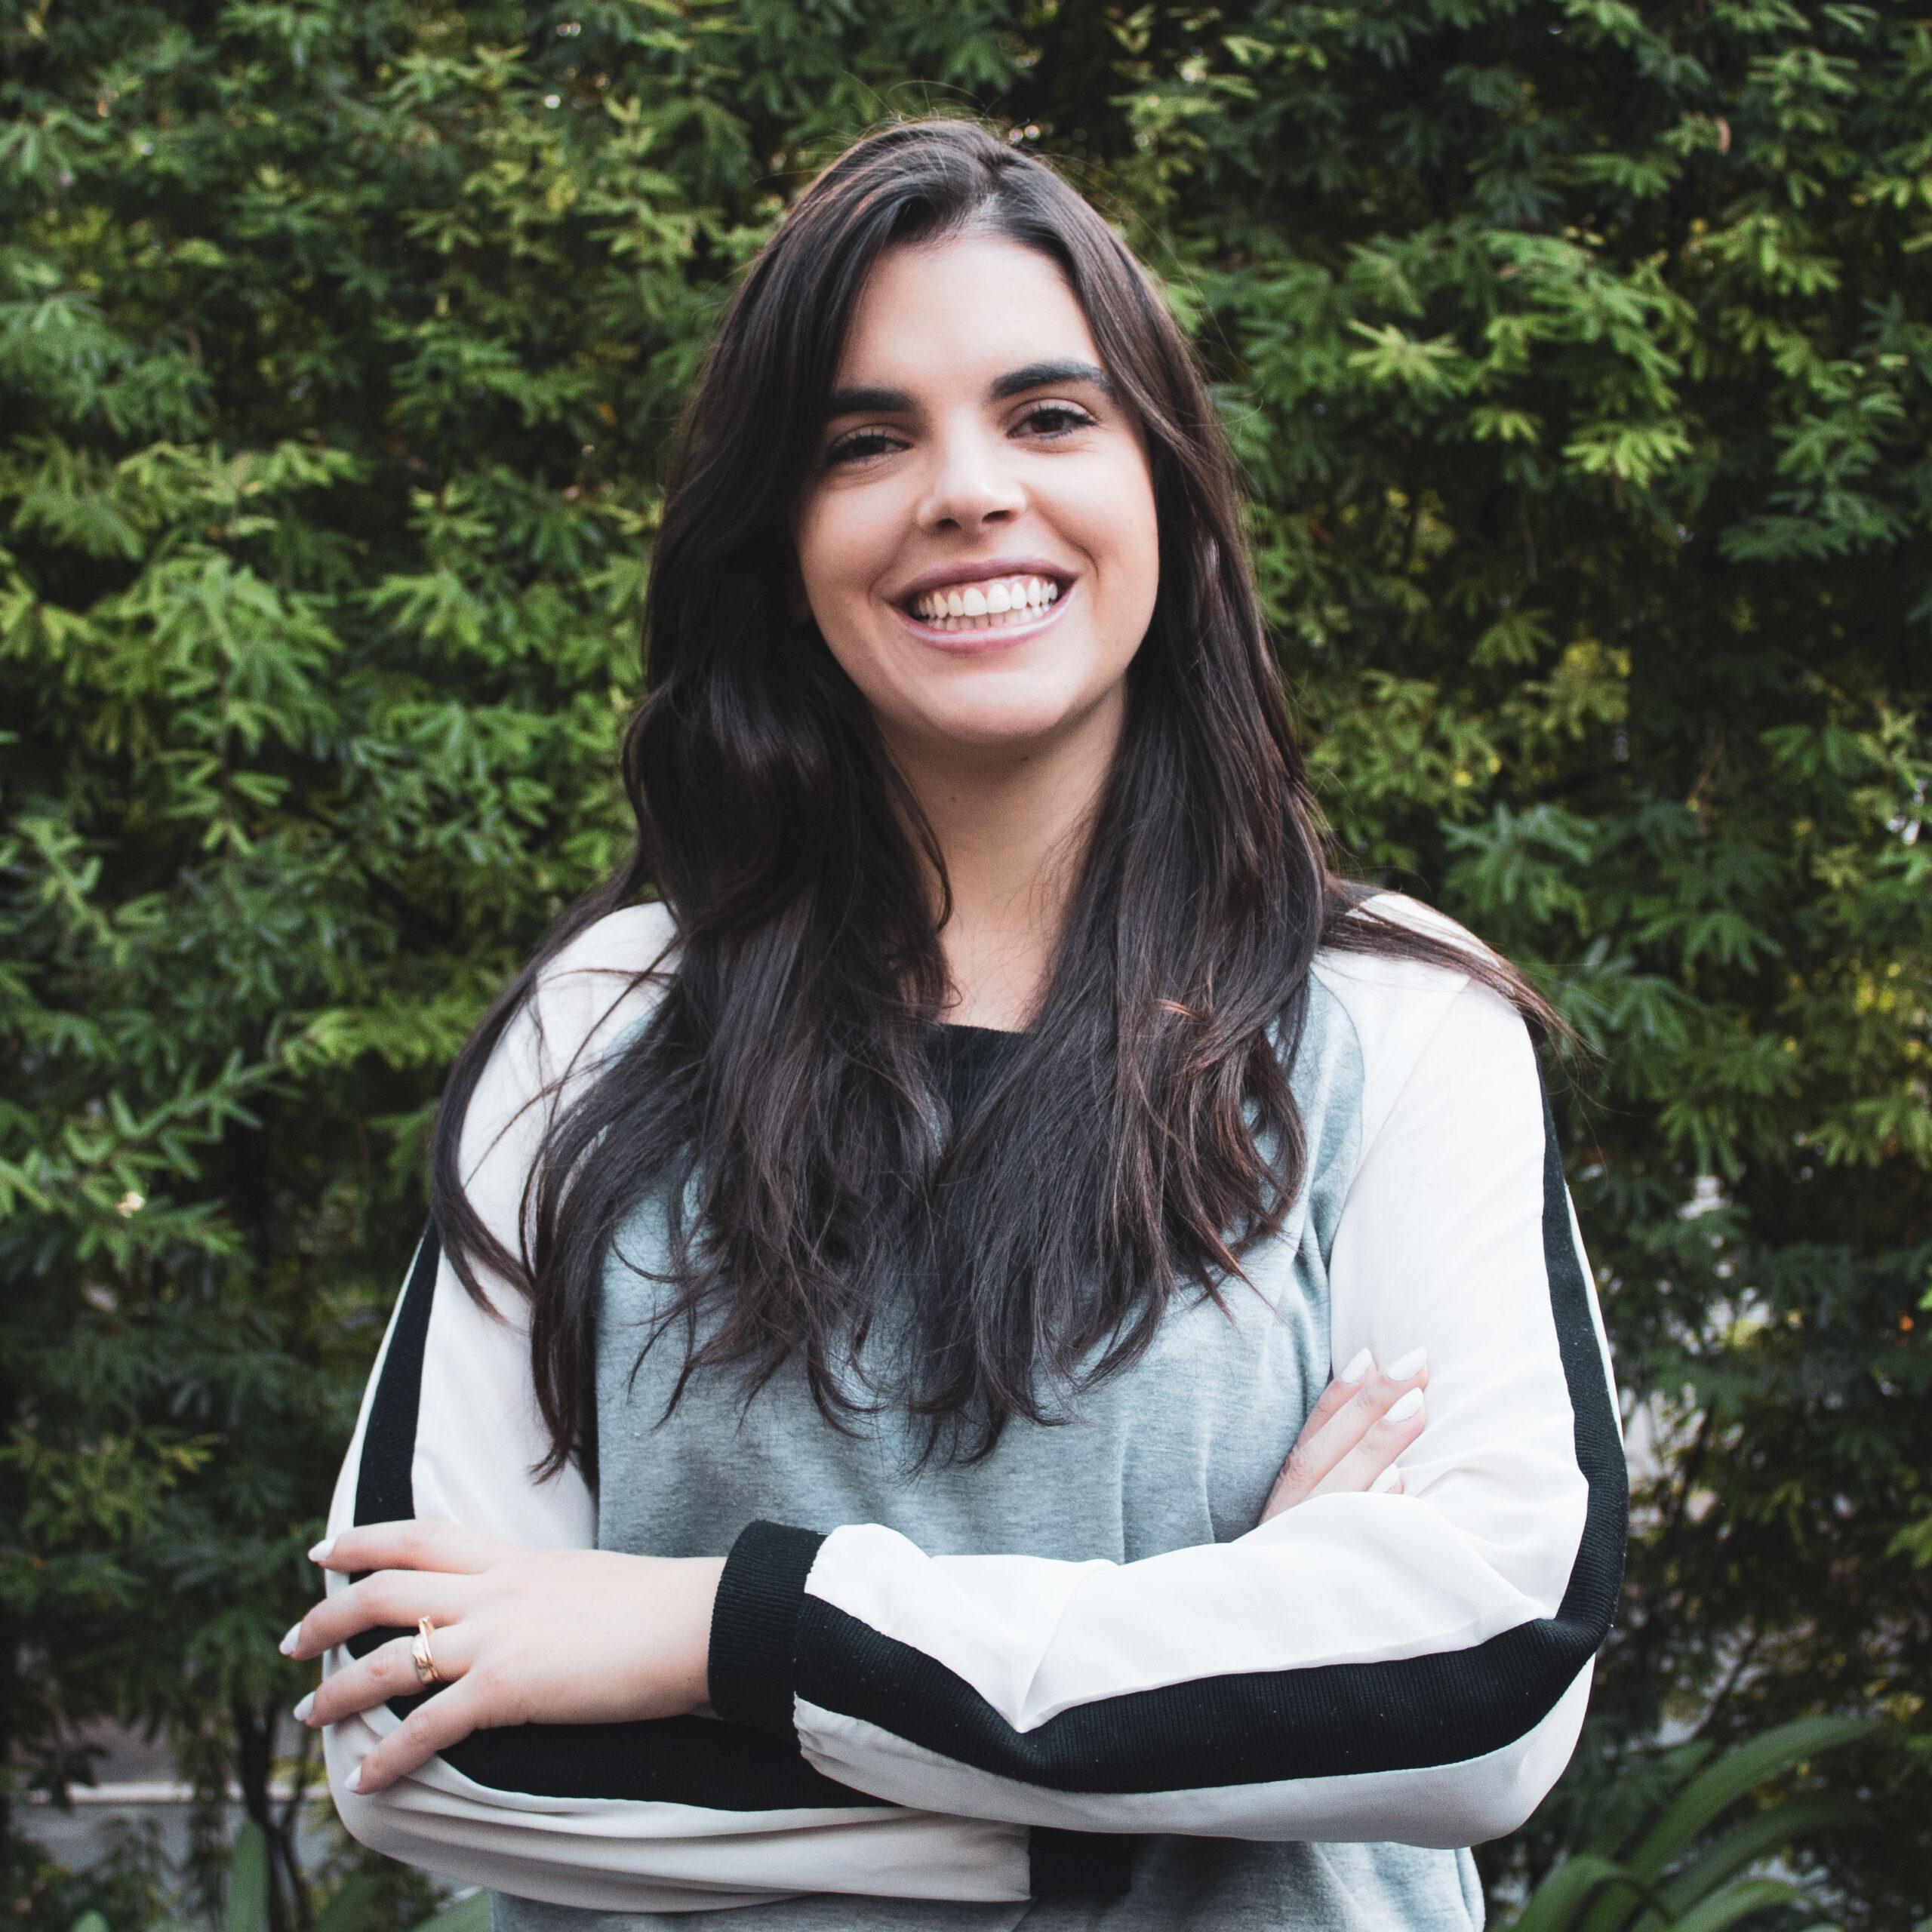 Marta Resende